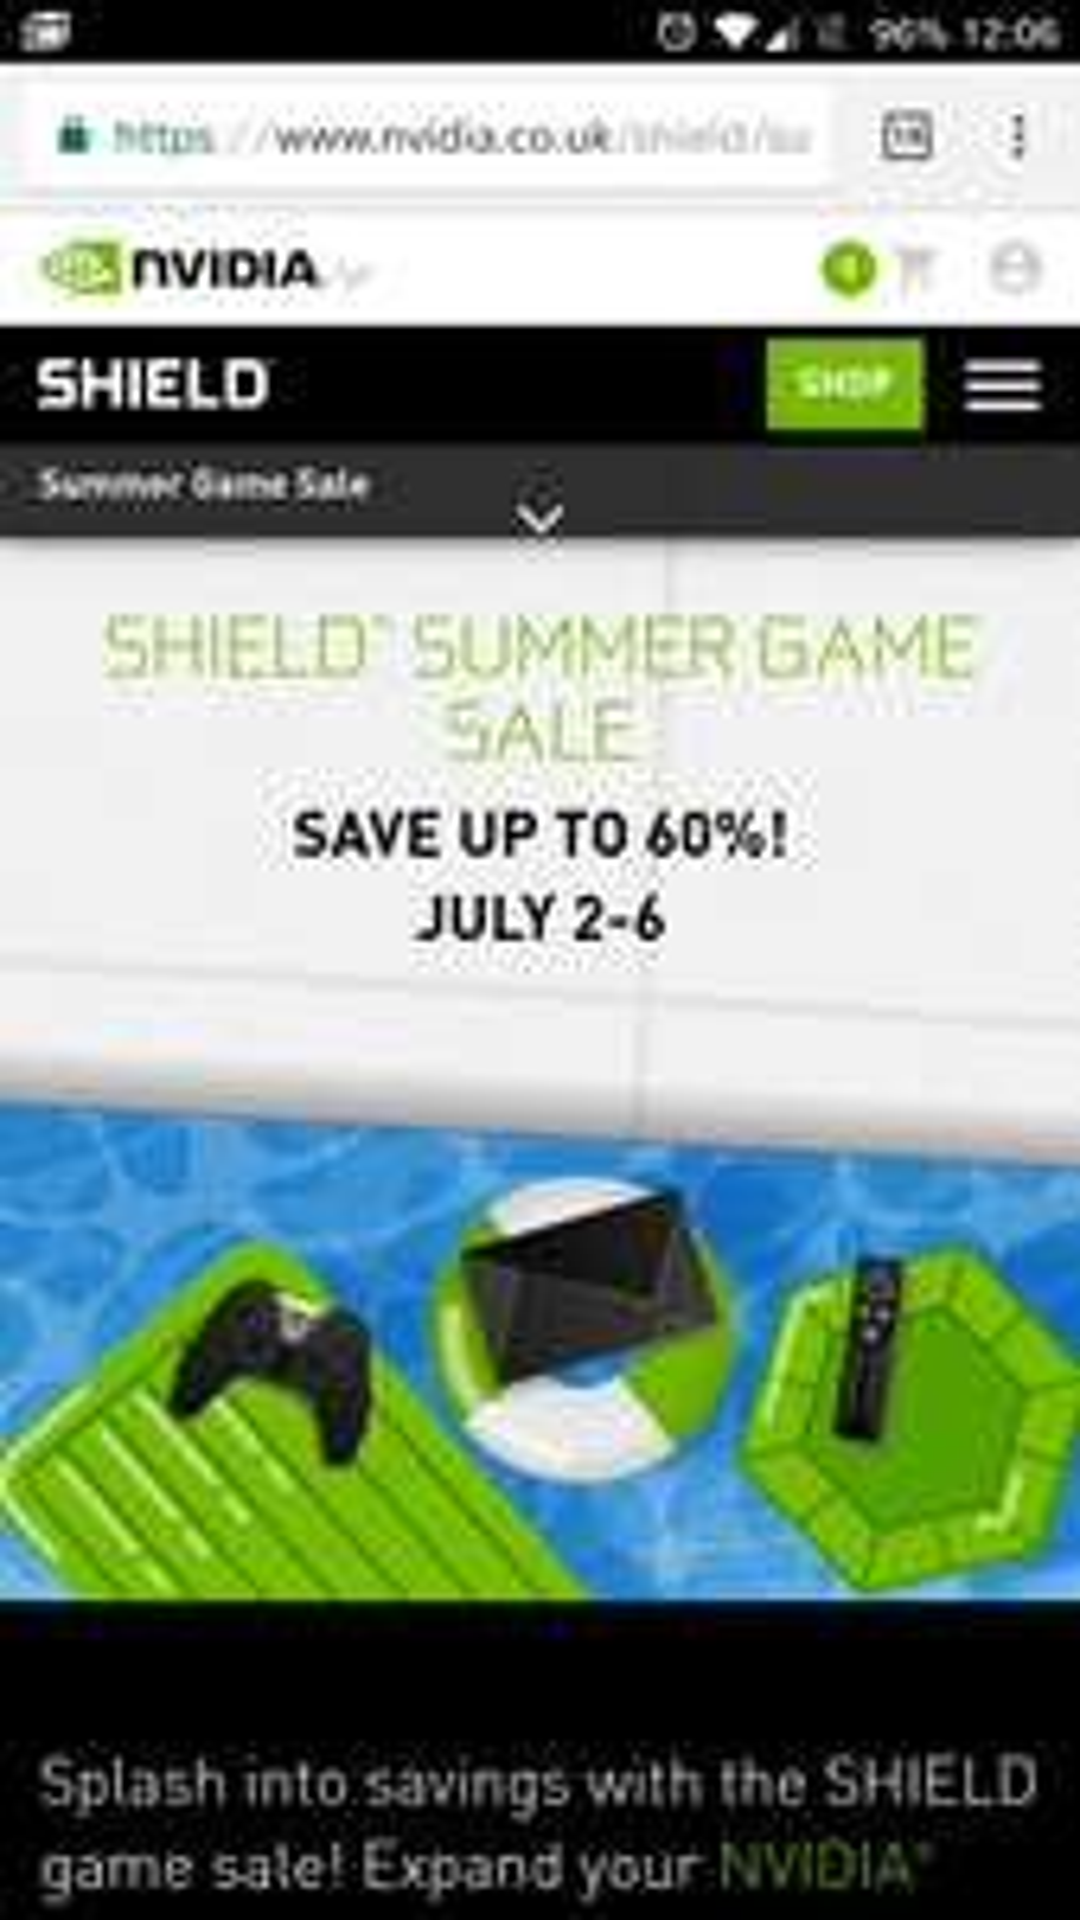 nvidia shield sumer game sale